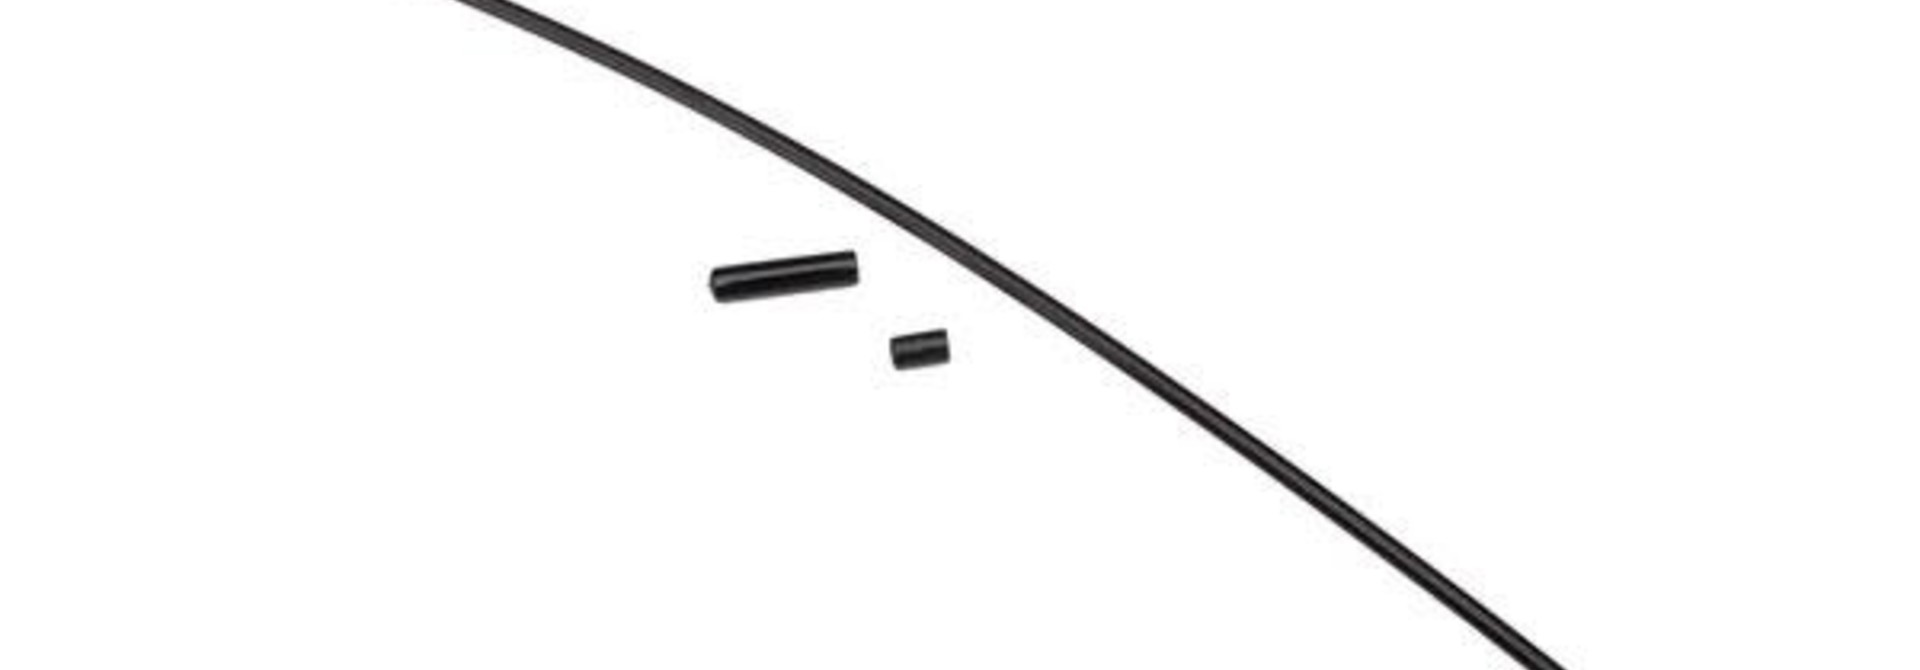 Antenna, tube, black (1)/ vinyl antenna cap (1)/ wire retainer (1)